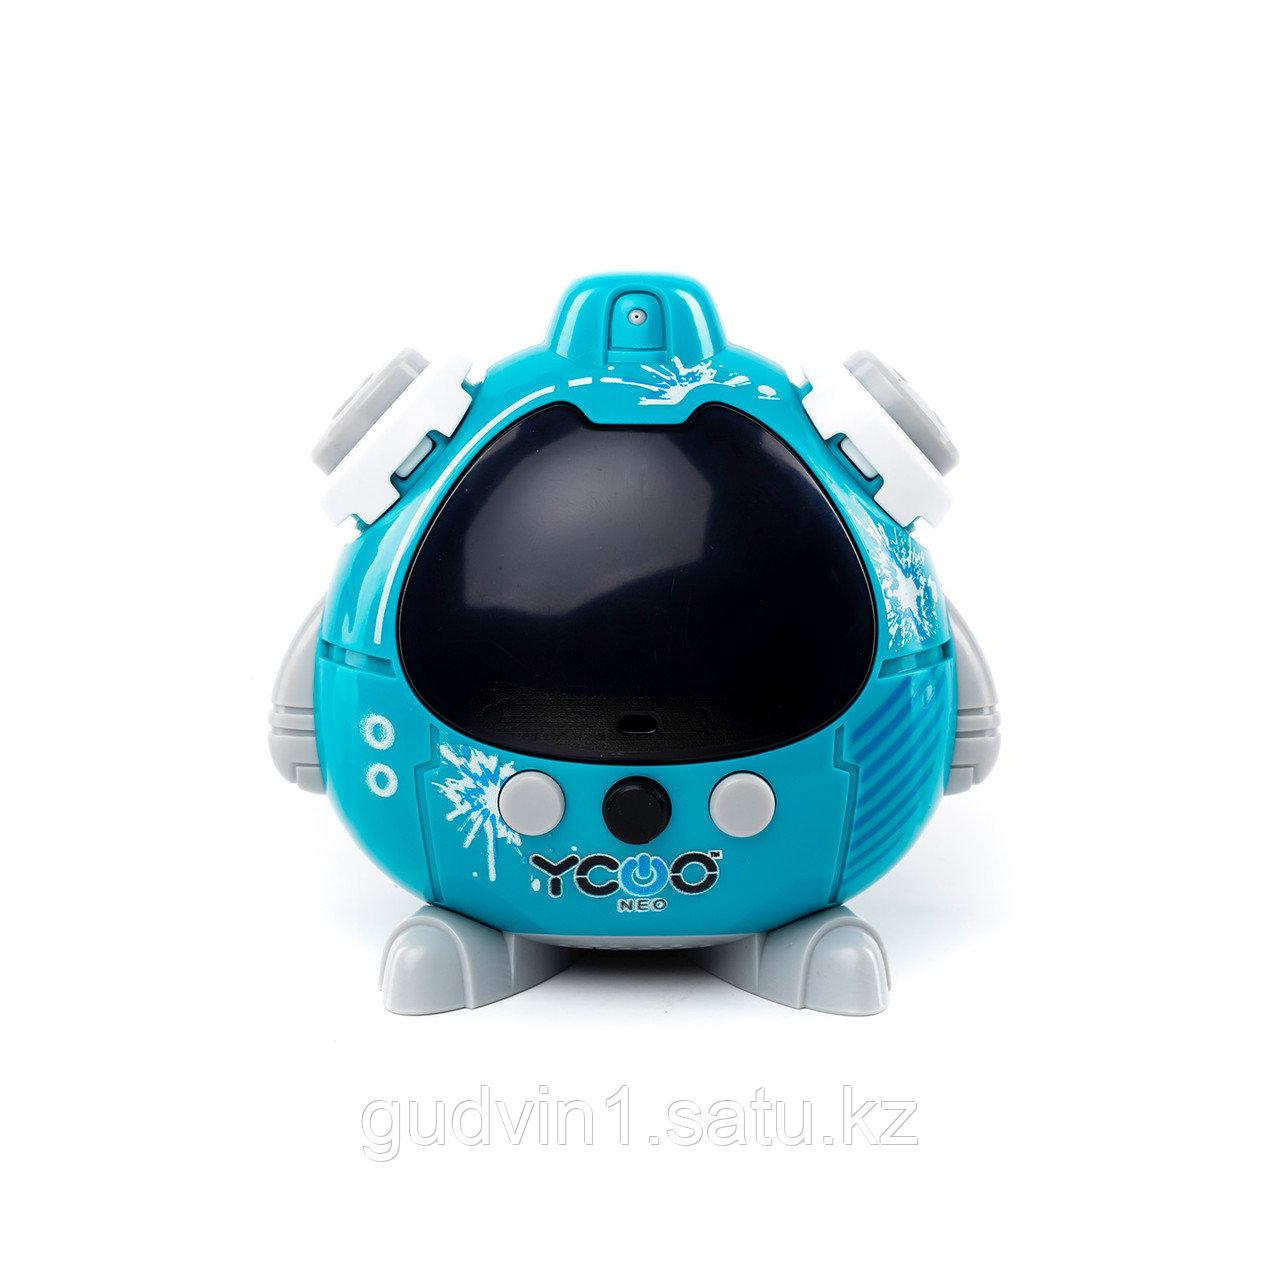 Робот Квизи синий 88574-3